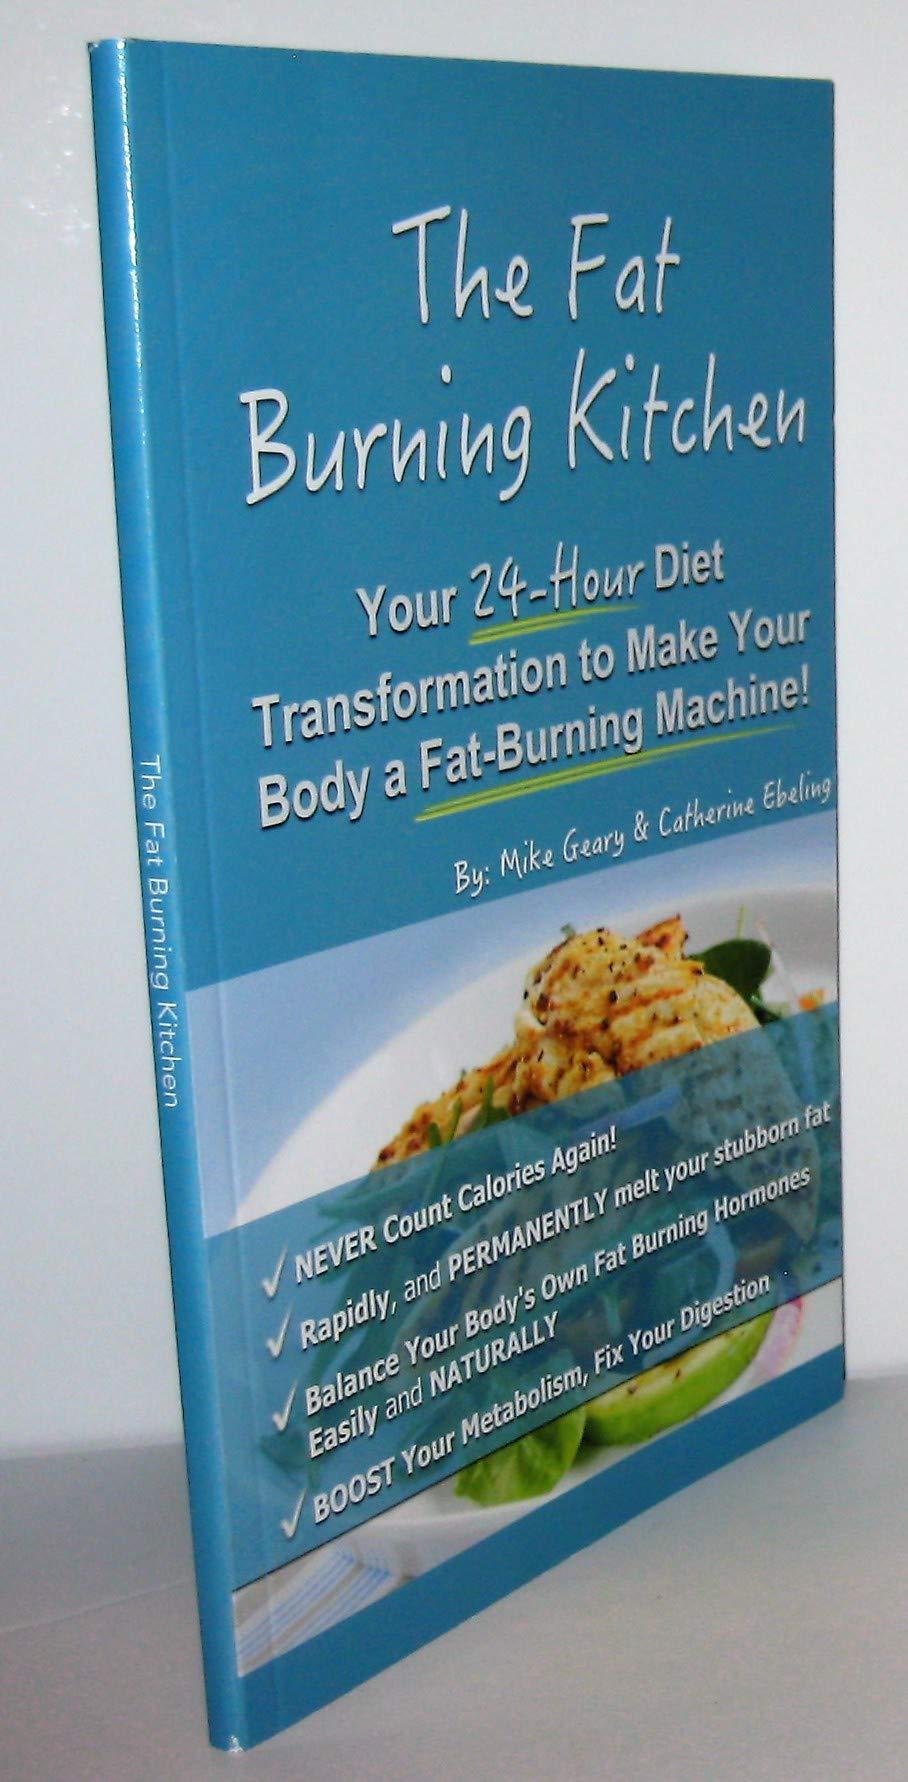 24hr fatburn recenzii